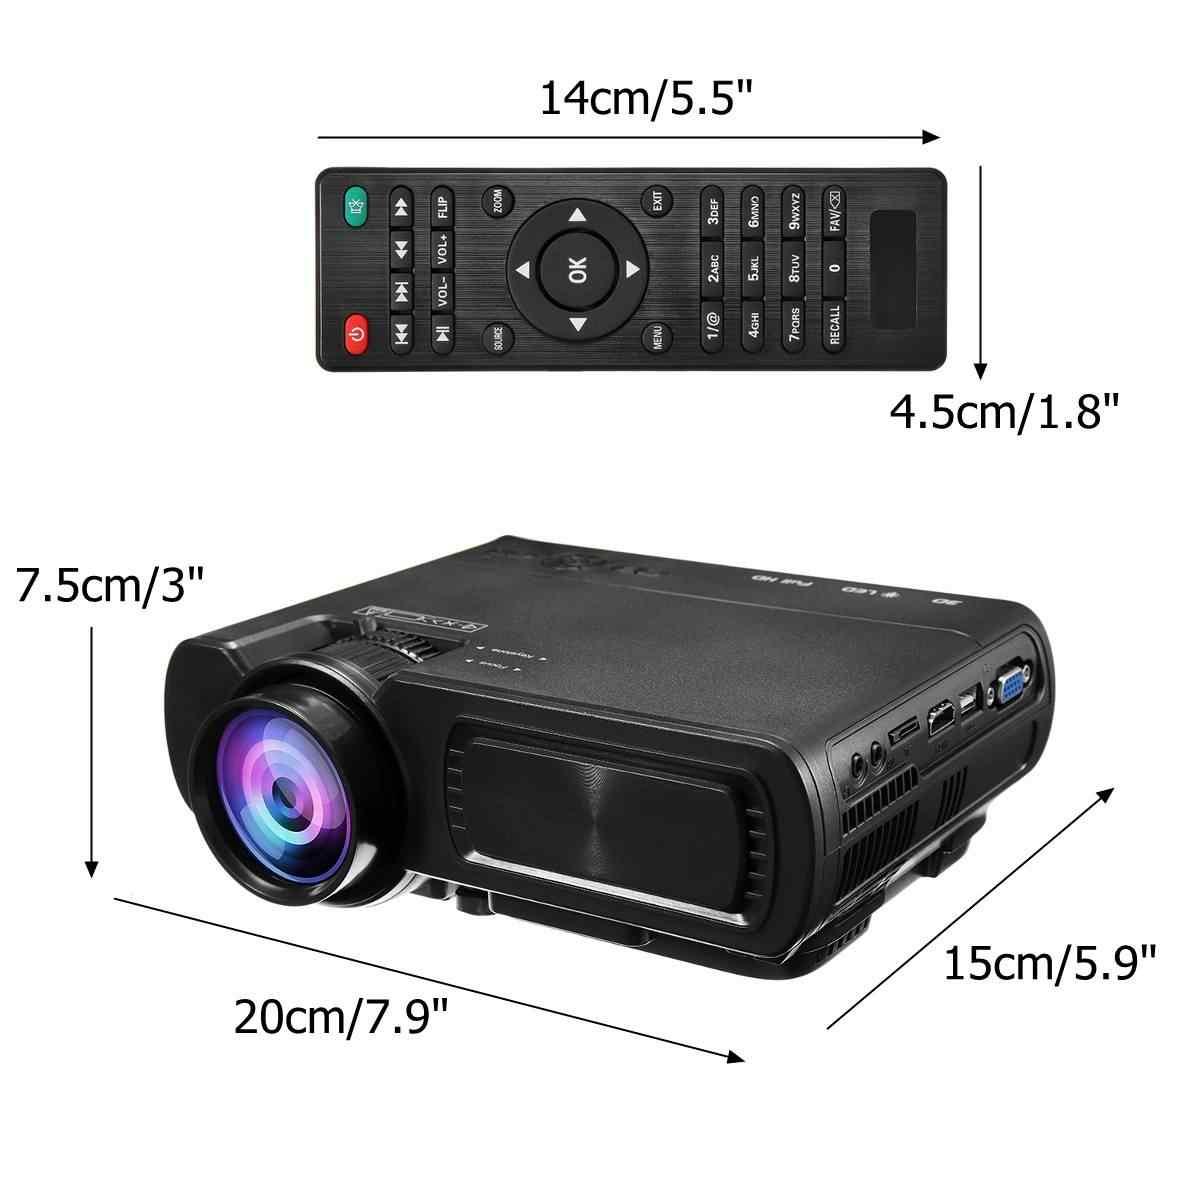 Мини-проектор T5 ЖК-дисплей 7000 люмен 1080 P Full HD, Wi-Fi, bluetooth домашний Театр Android 6,0 аудио динамик для домашнего кинотеатра Кино